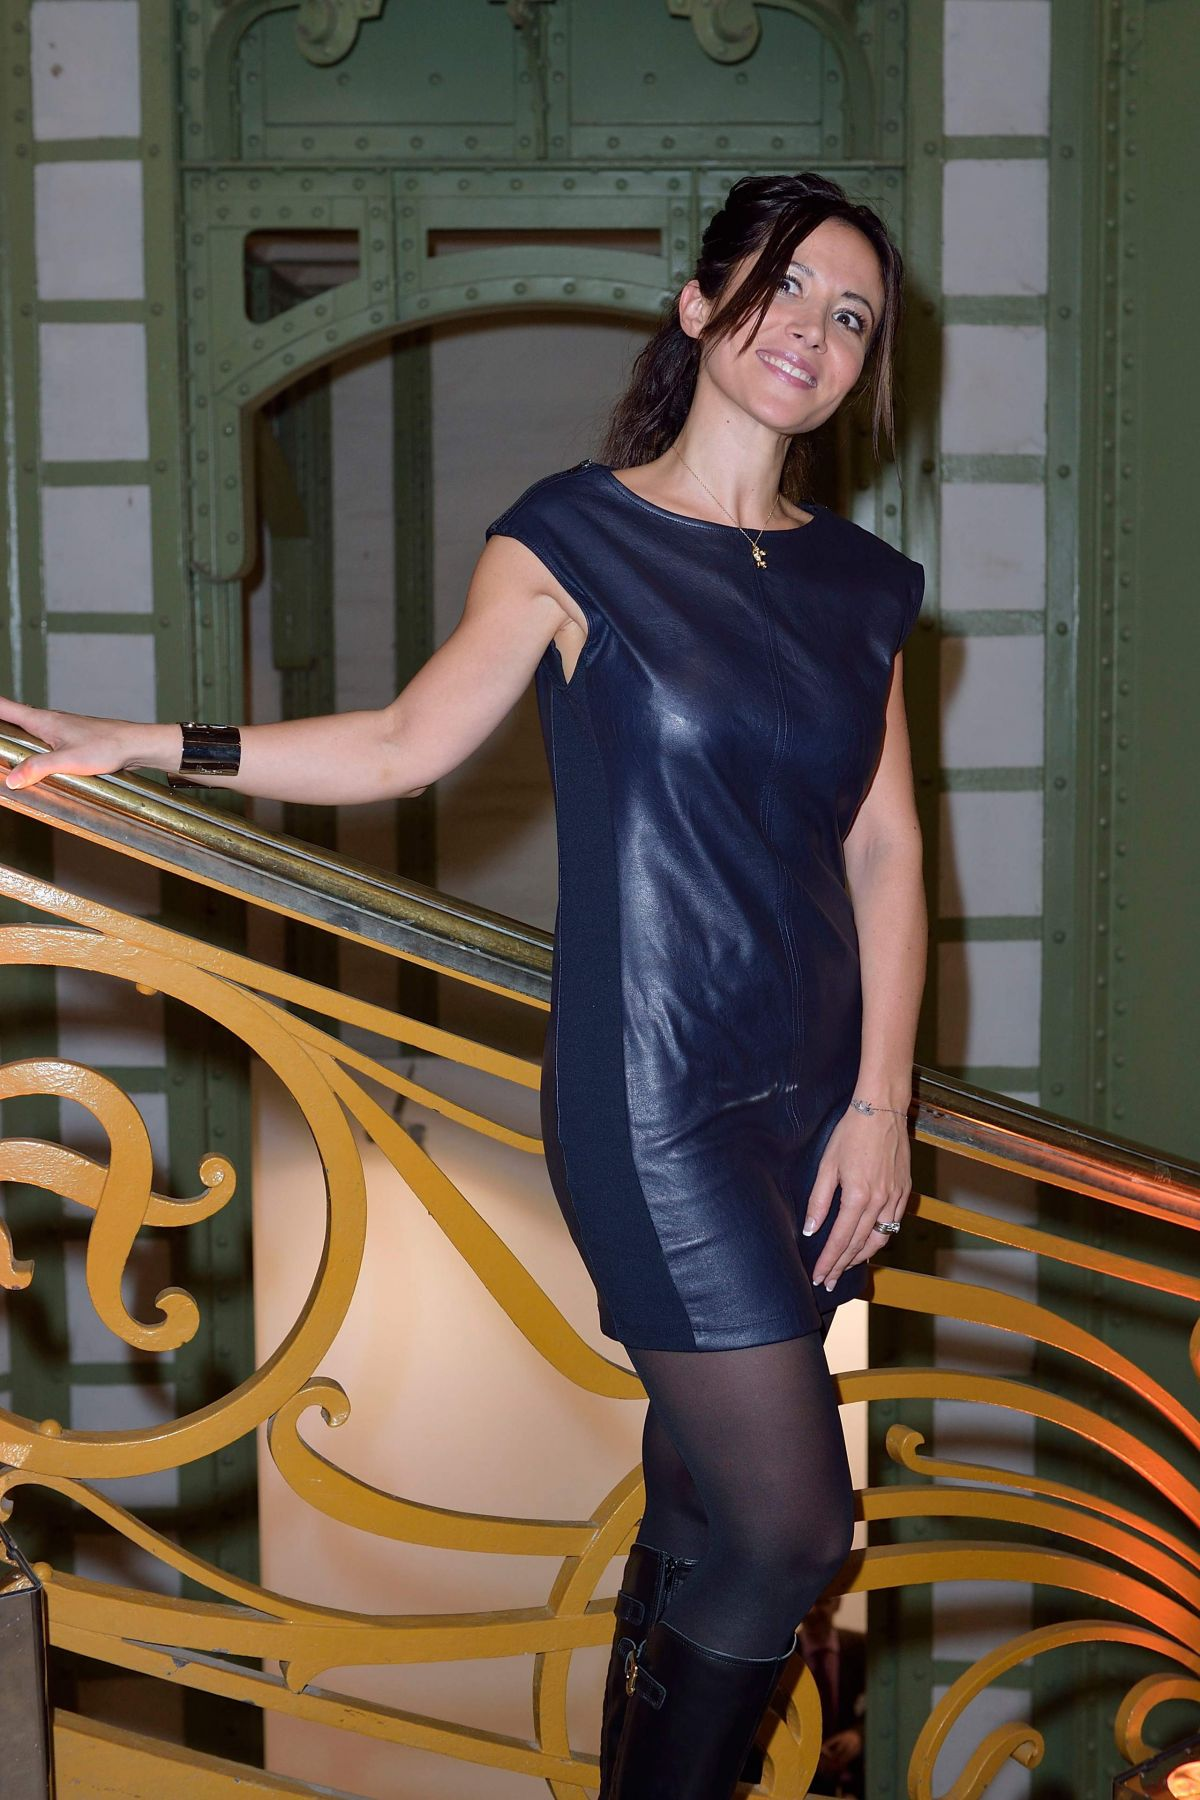 FABIENNE CARAT at Fiac 2015 Orange Party Inauguration at Grand Palais in Paris 10/21/2015